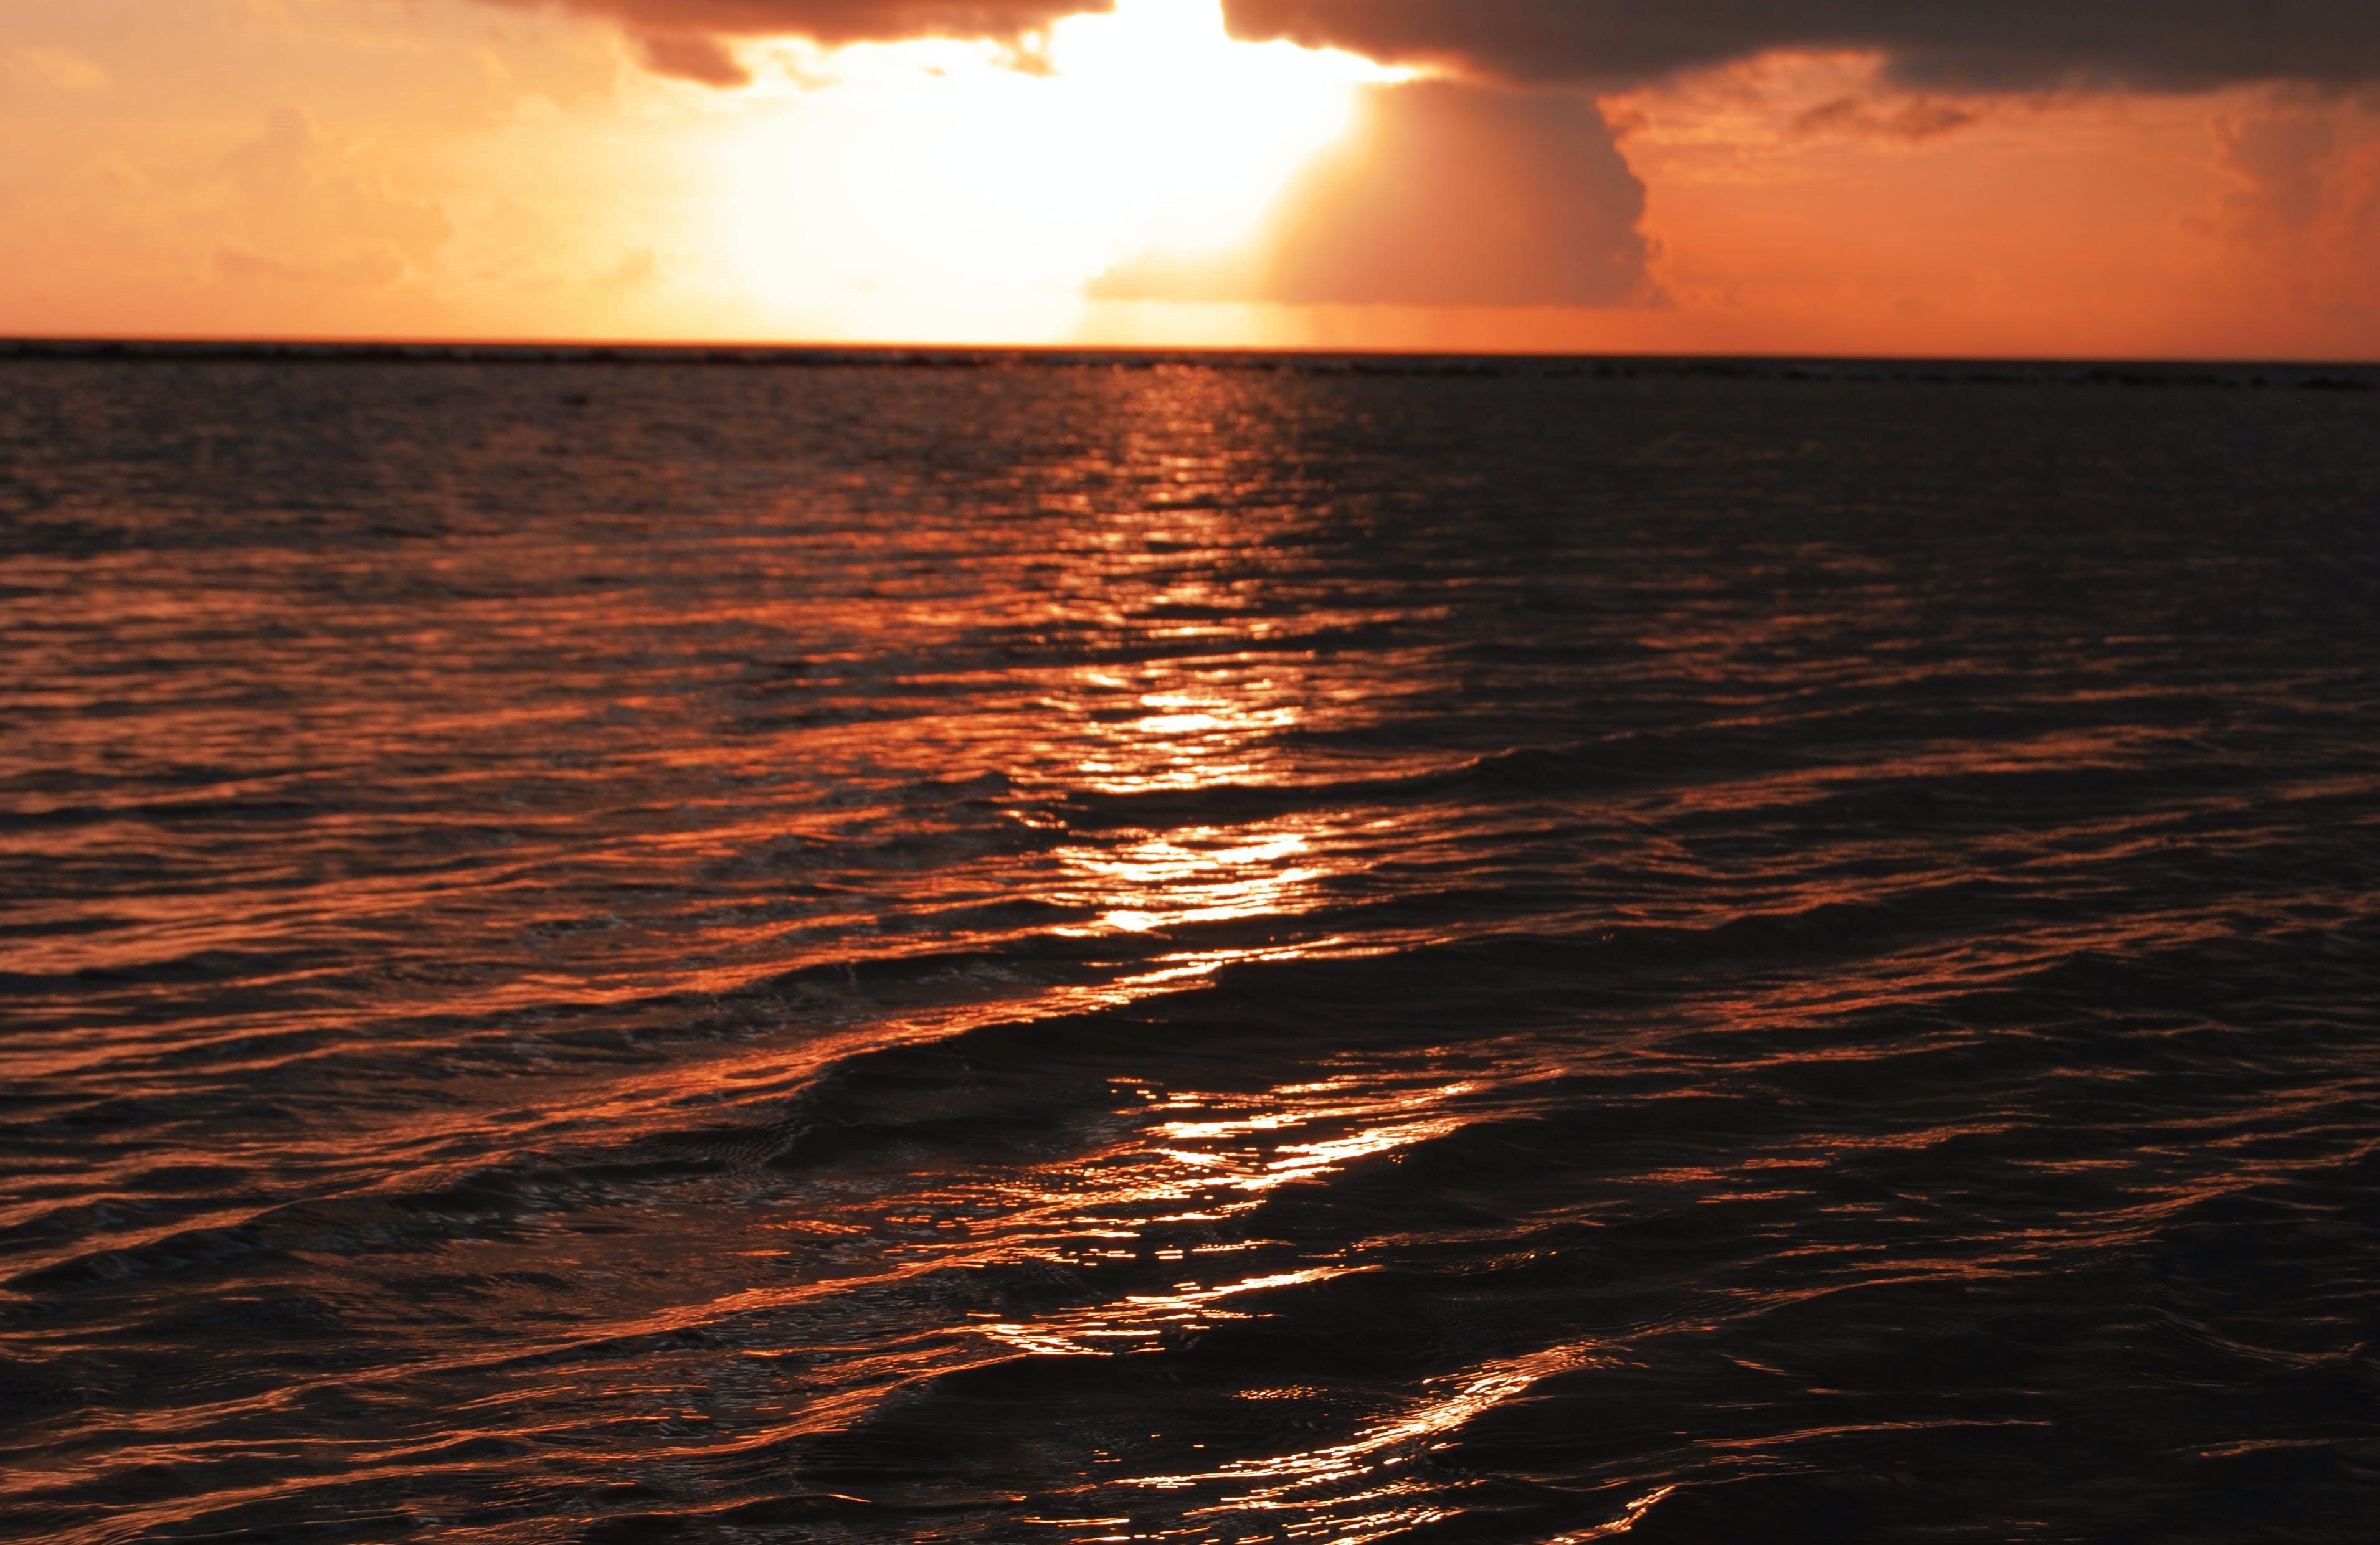 Free stock photo of evening sun, filter, golden sunset, nature photography